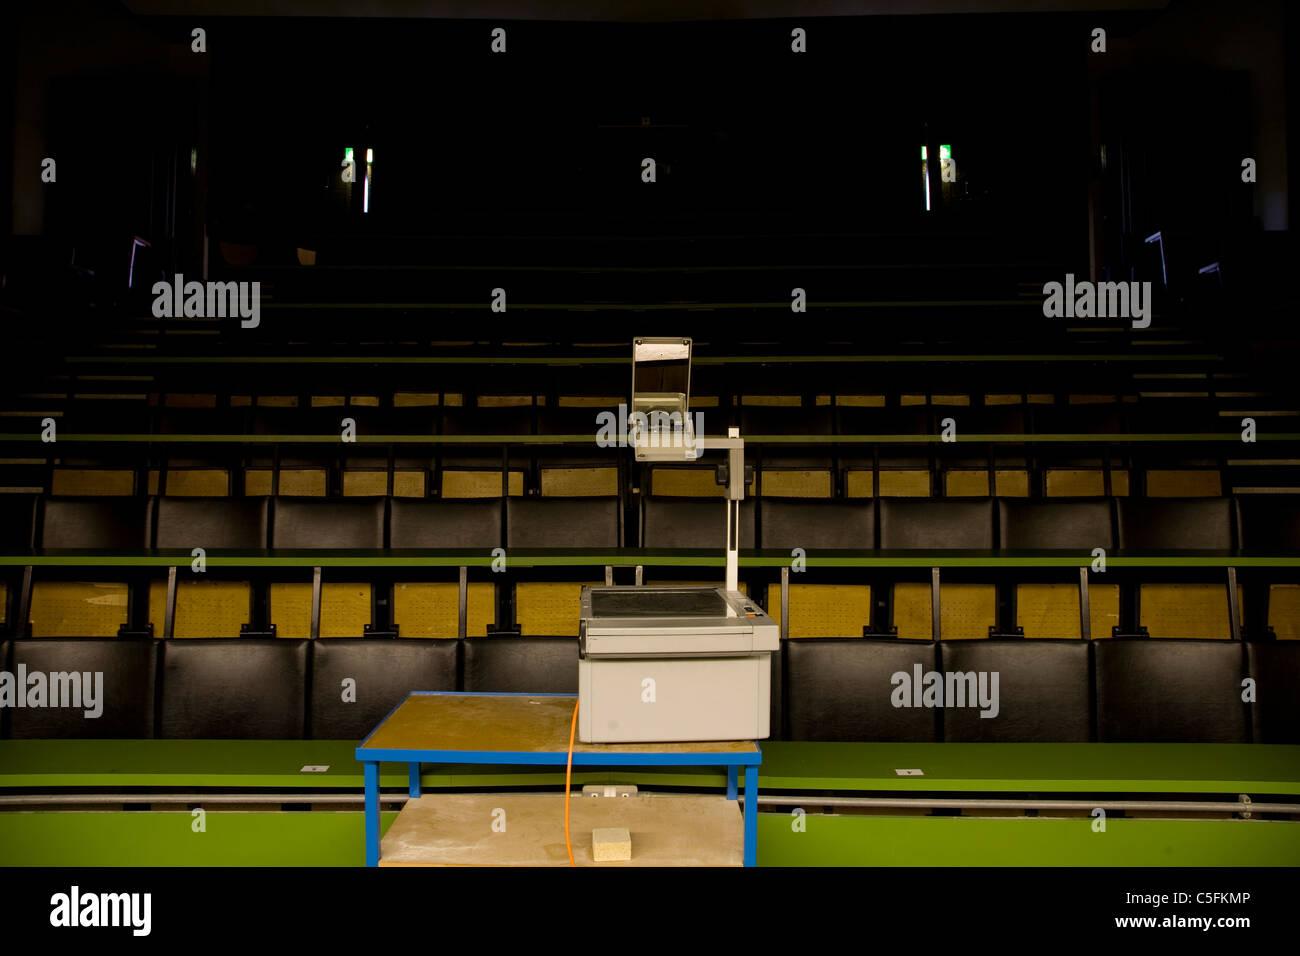 University Lecture Theatre - Stock Image